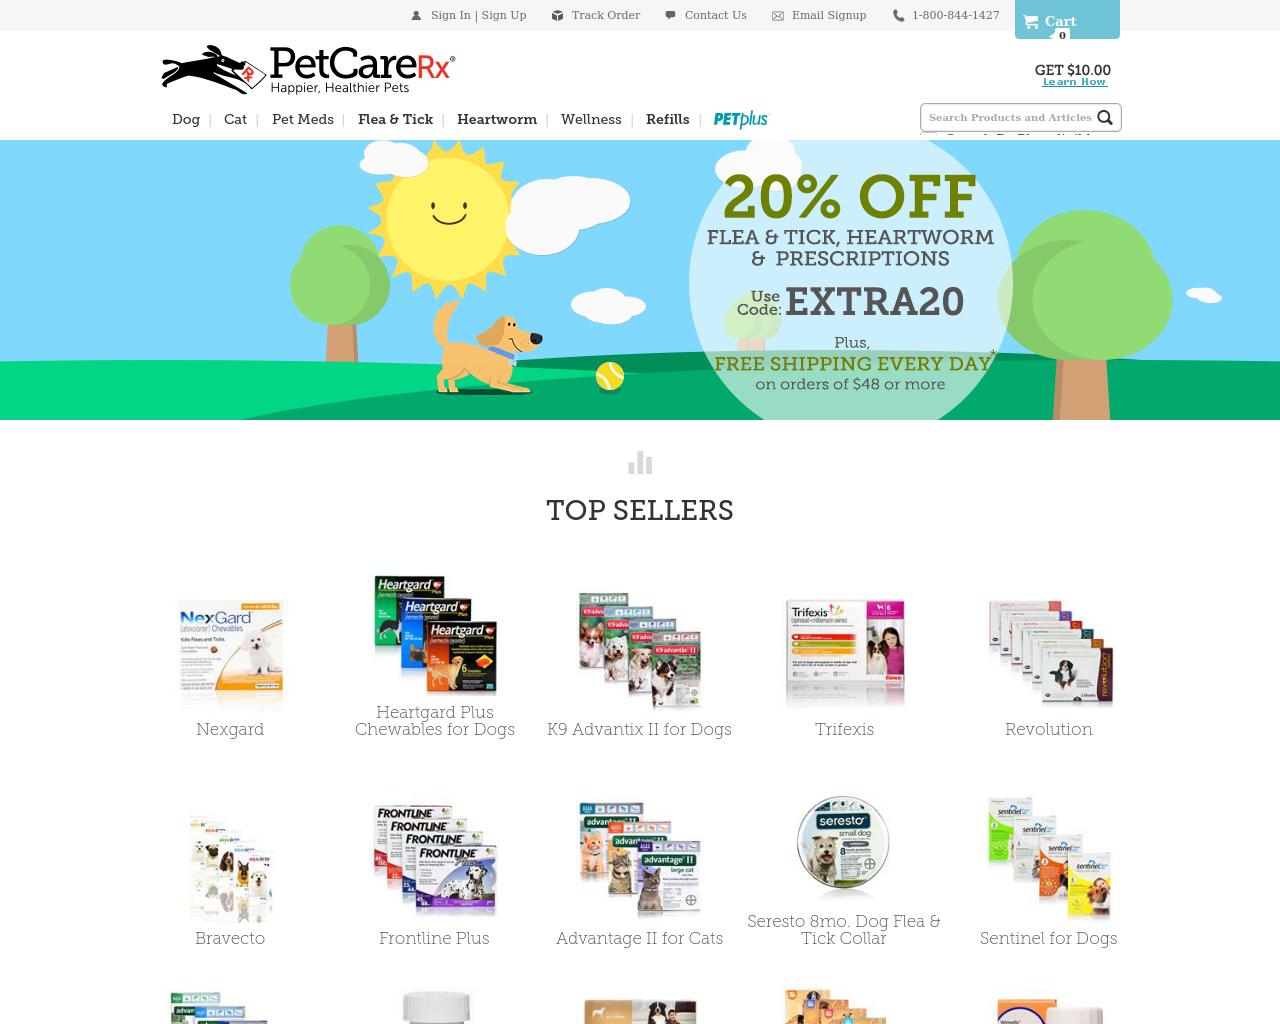 PetCareRx-Advertising-Reviews-Pricing